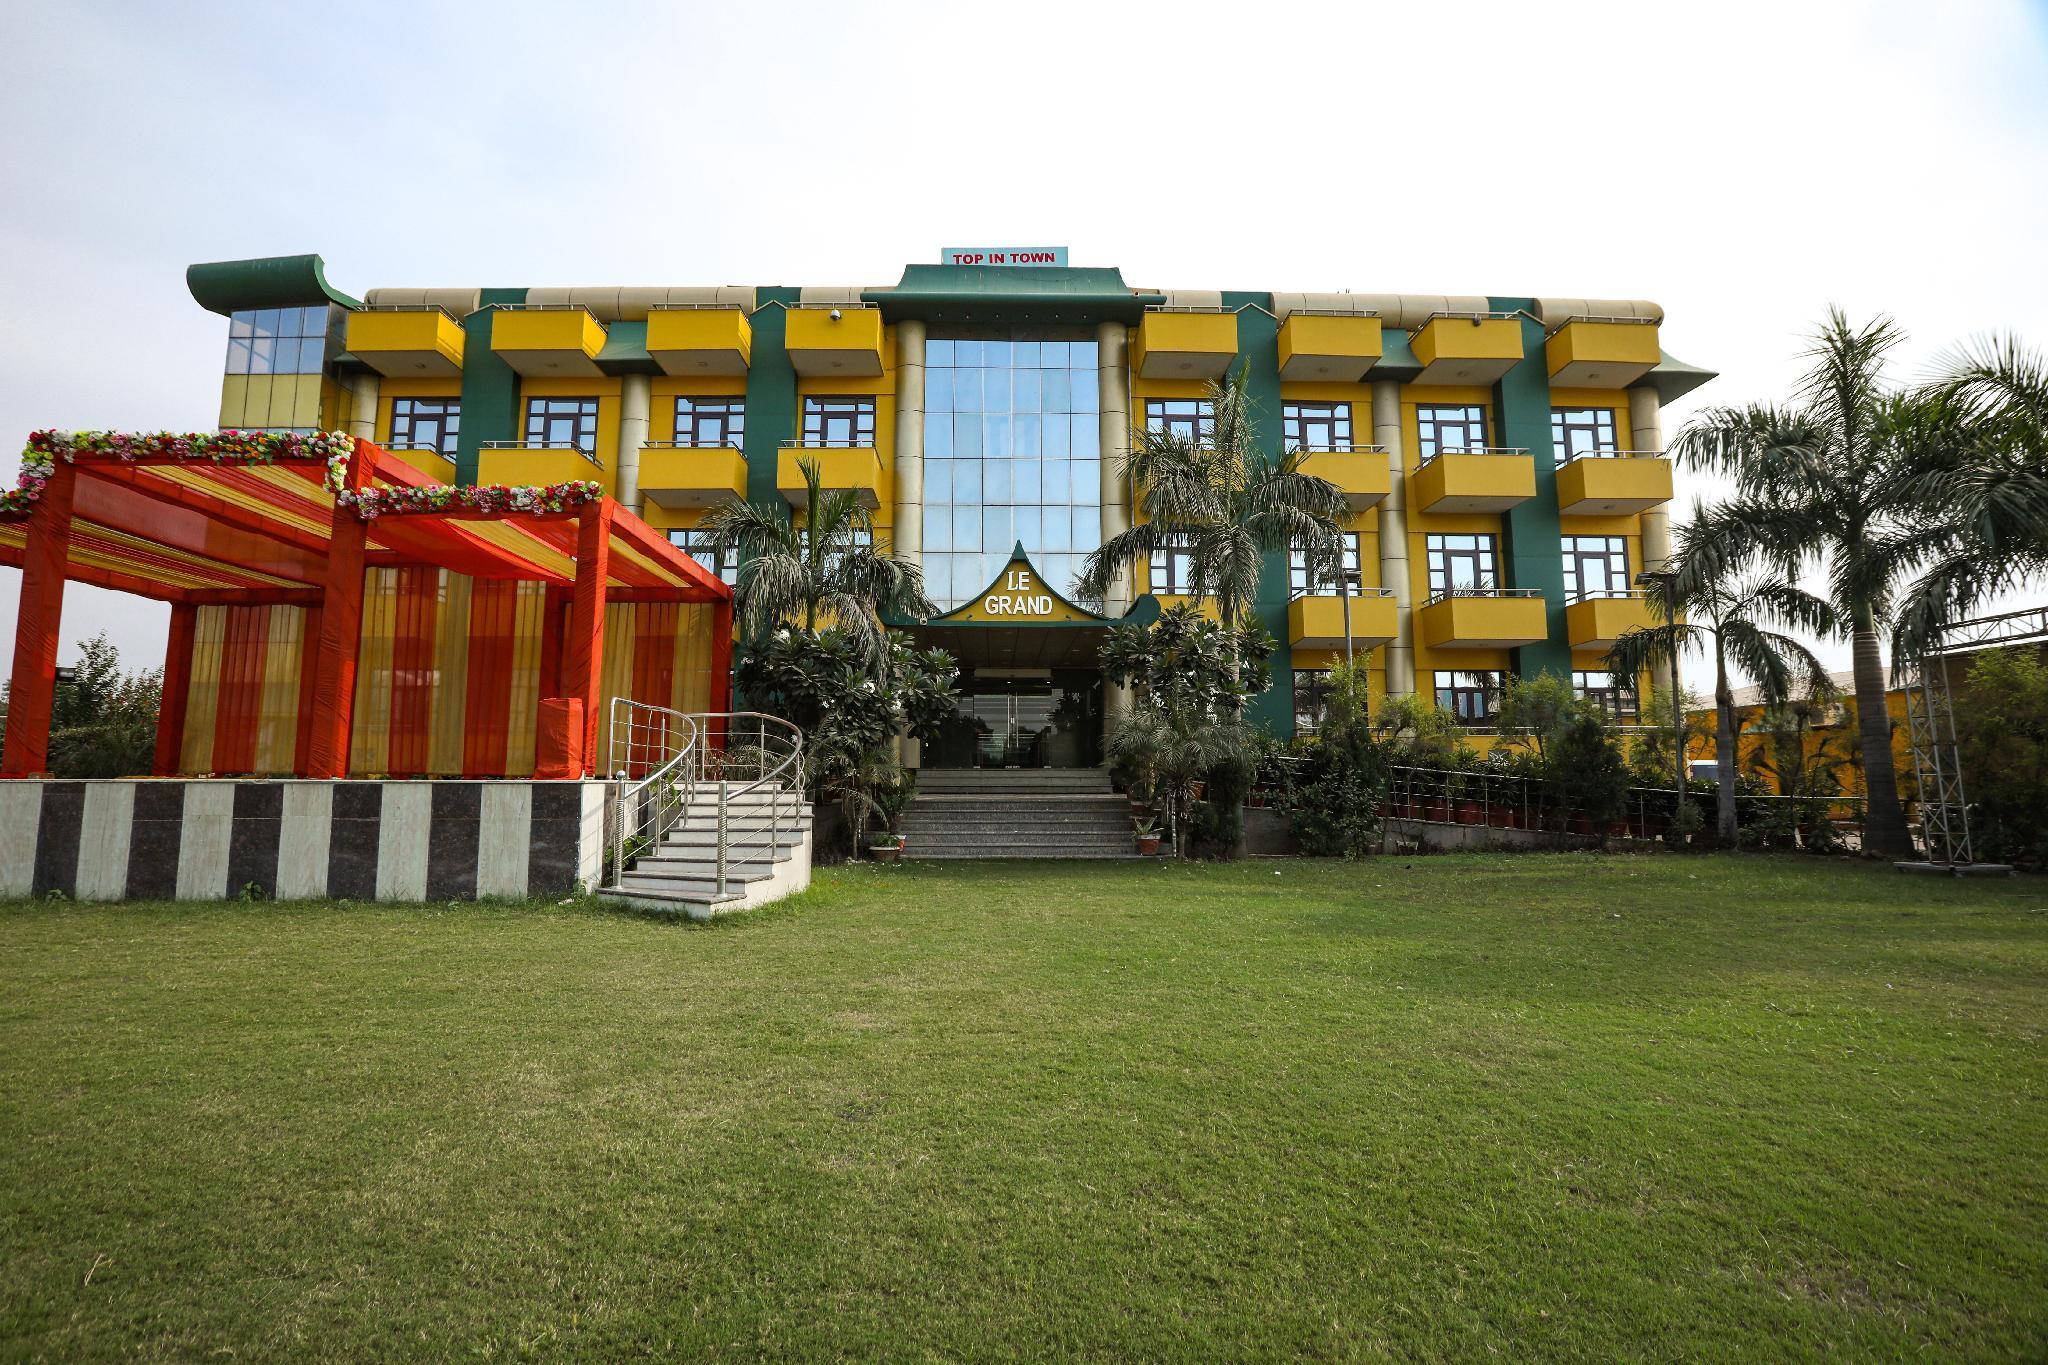 Le Grand Regency Hotel